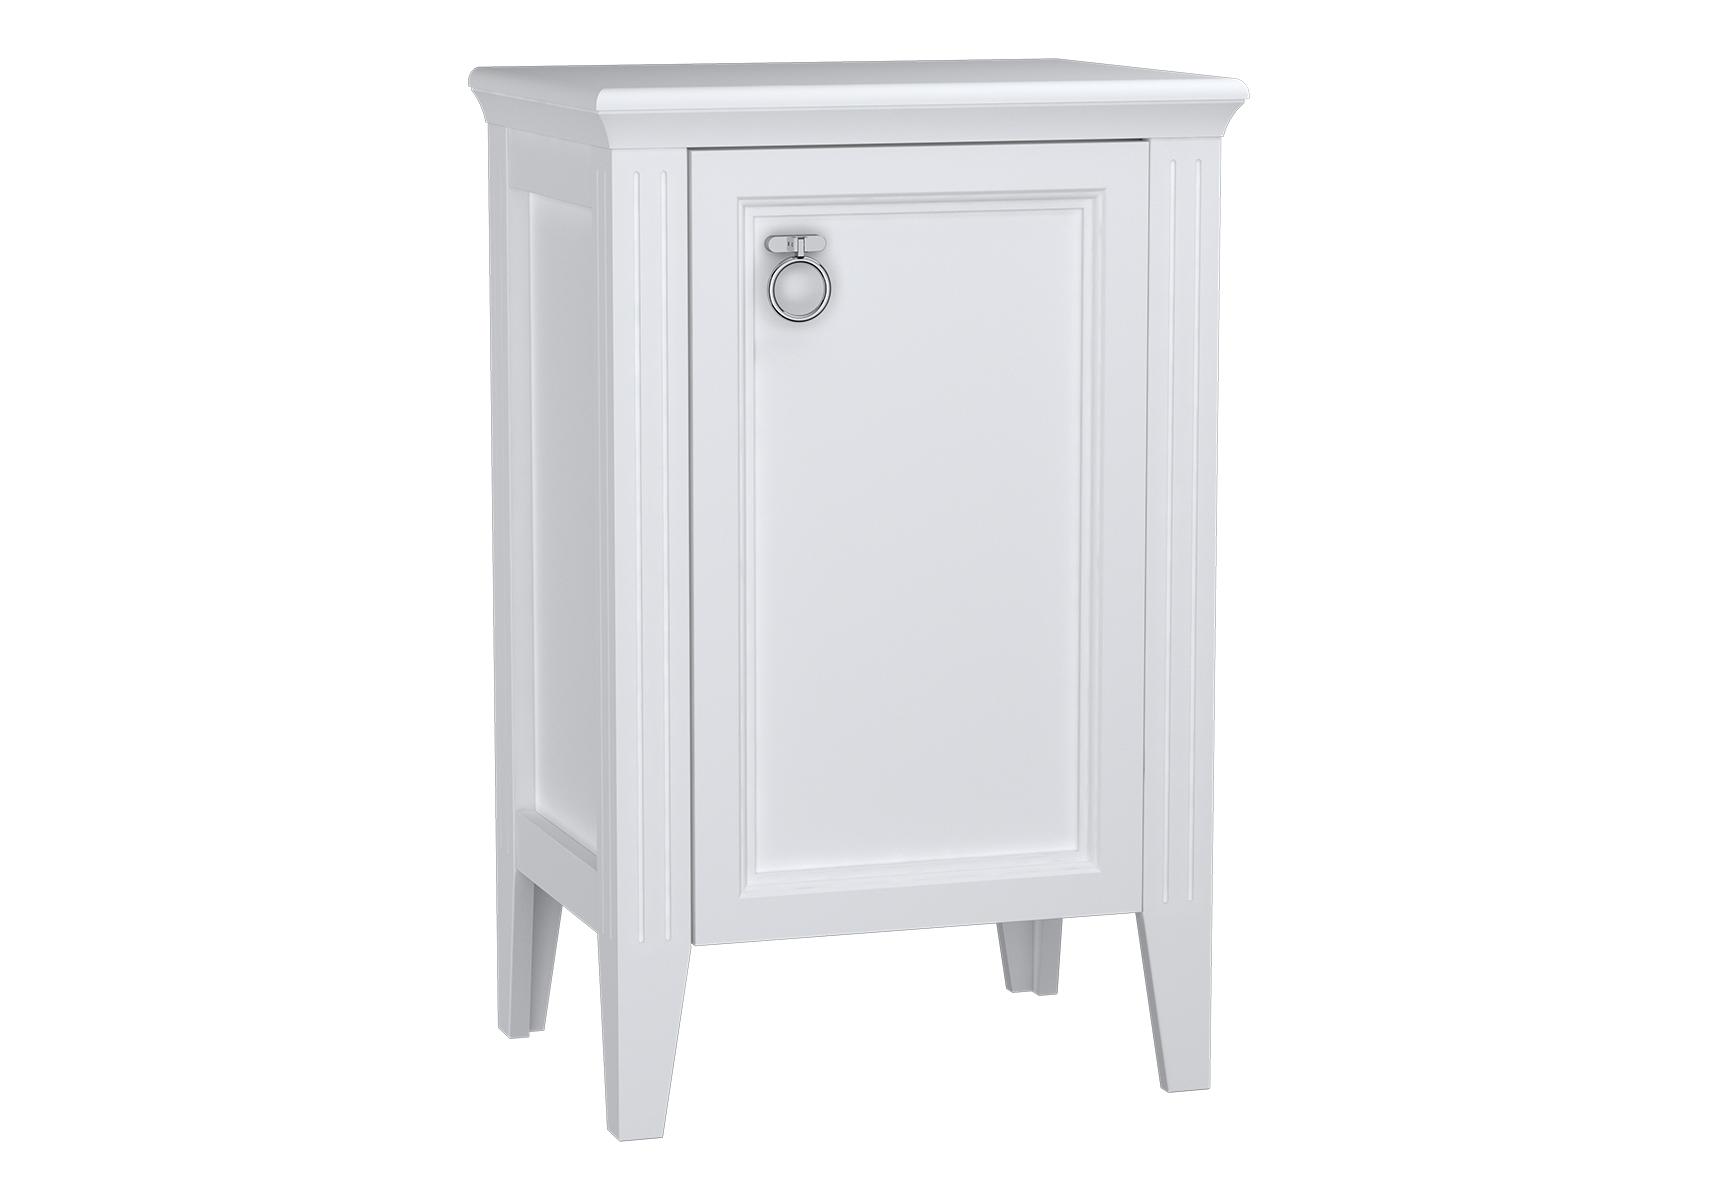 Valarte armoire mi-haute, 55 cm, porte à droite, blanc mat